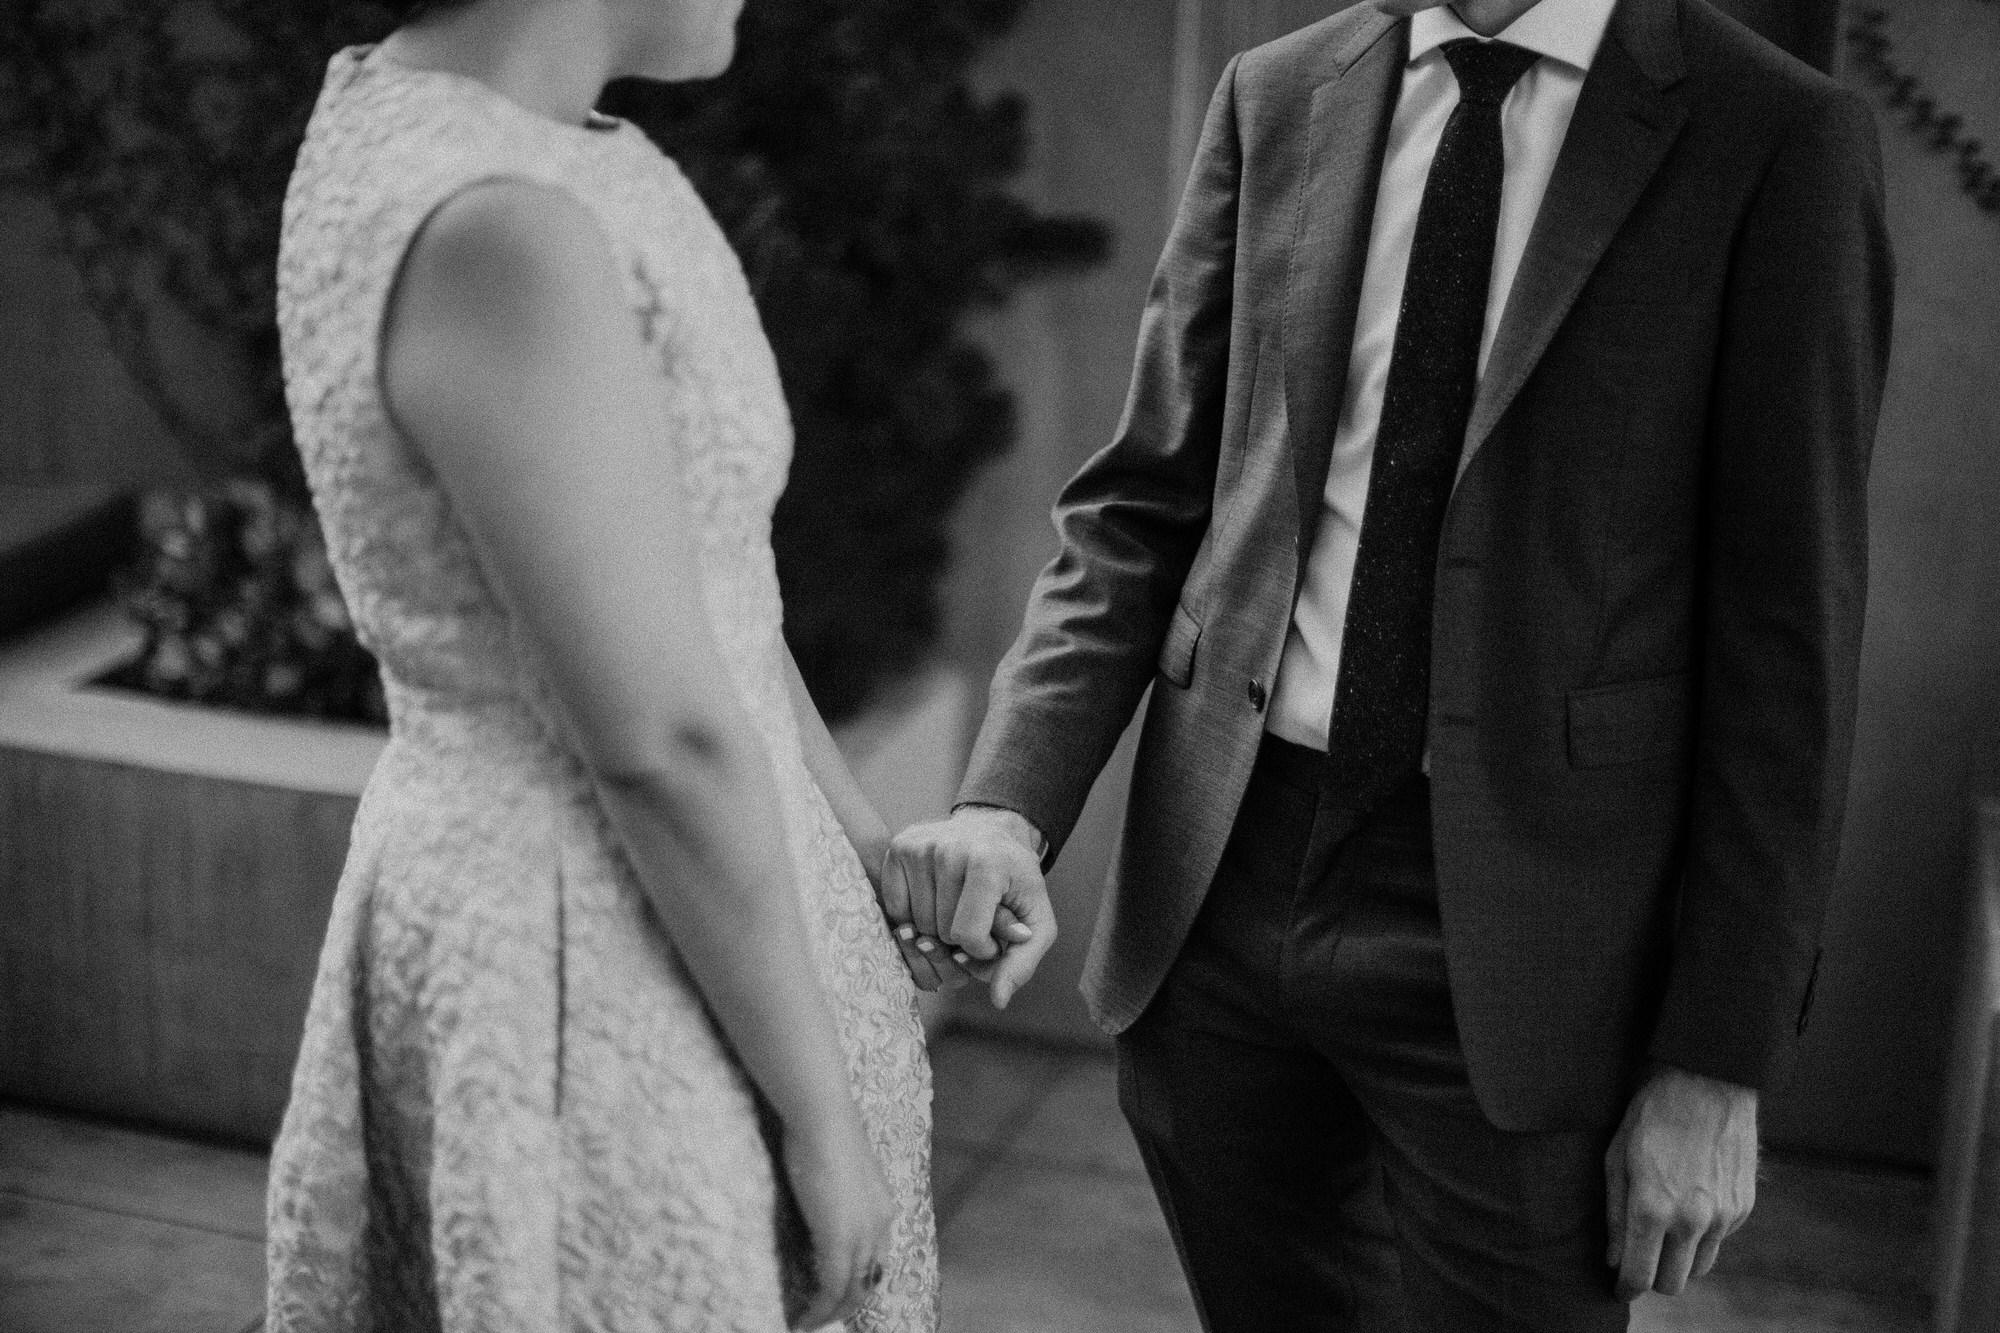 los-angeles-wedding-photographer-millwick-60.jpg